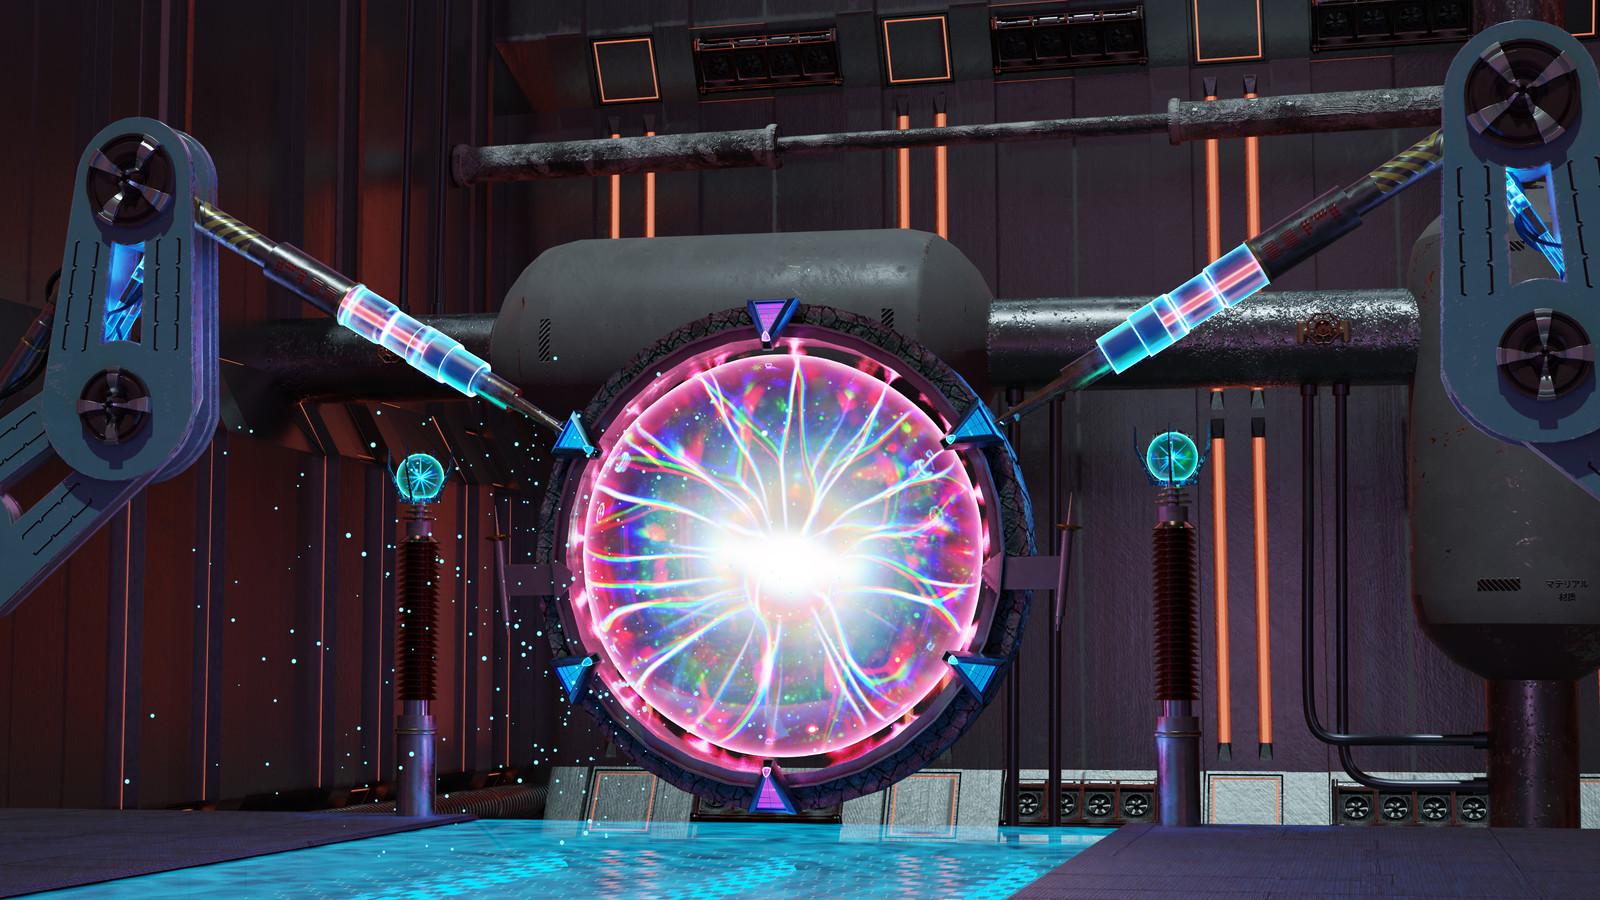 Magic Portal - Original 3D Animation Environment